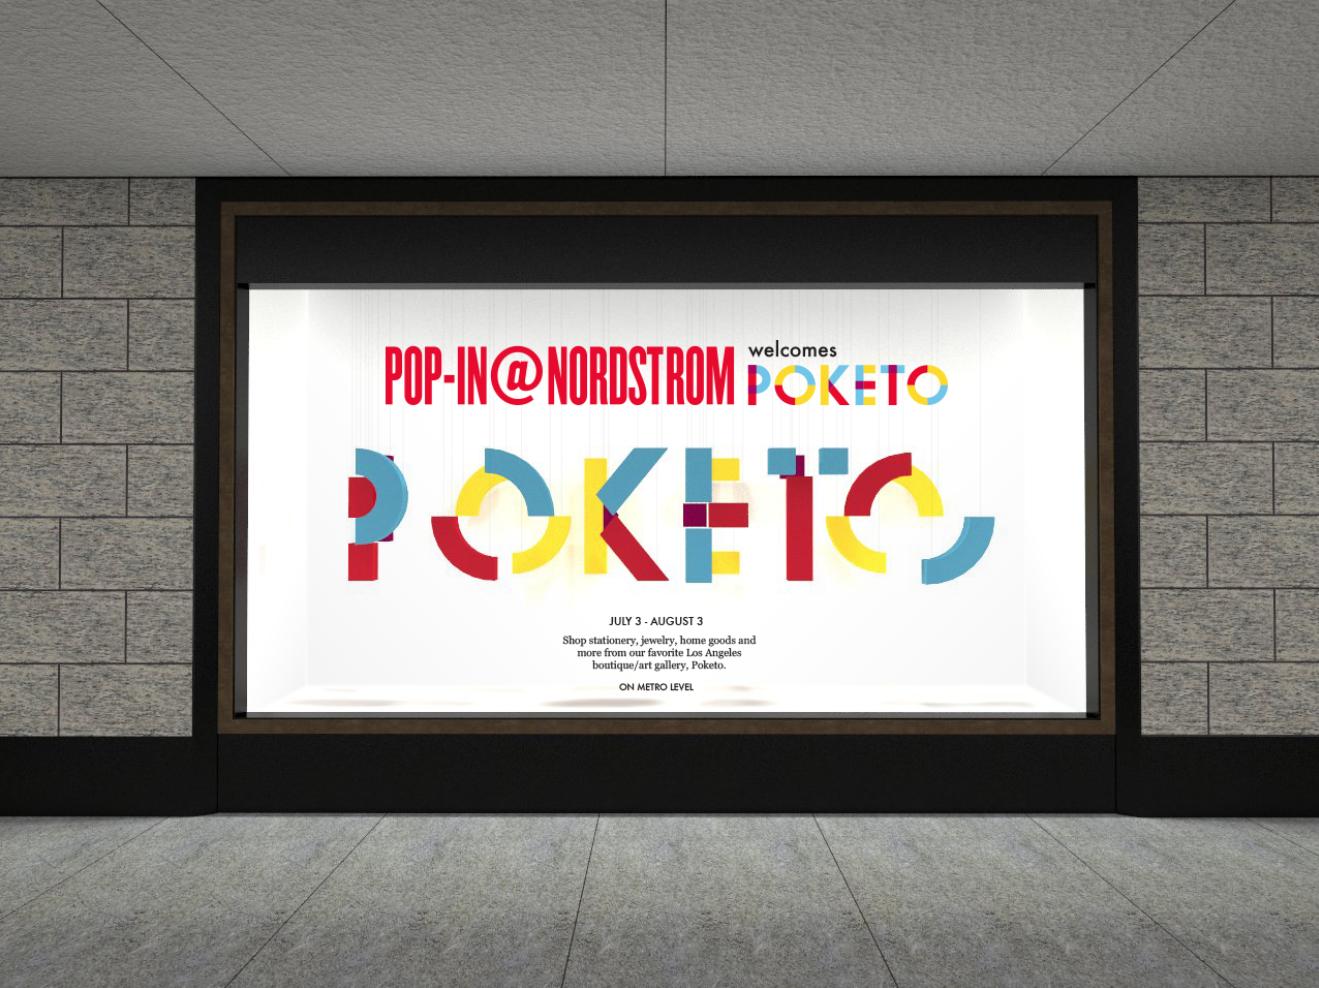 POKETO_Window_Concept_B.png